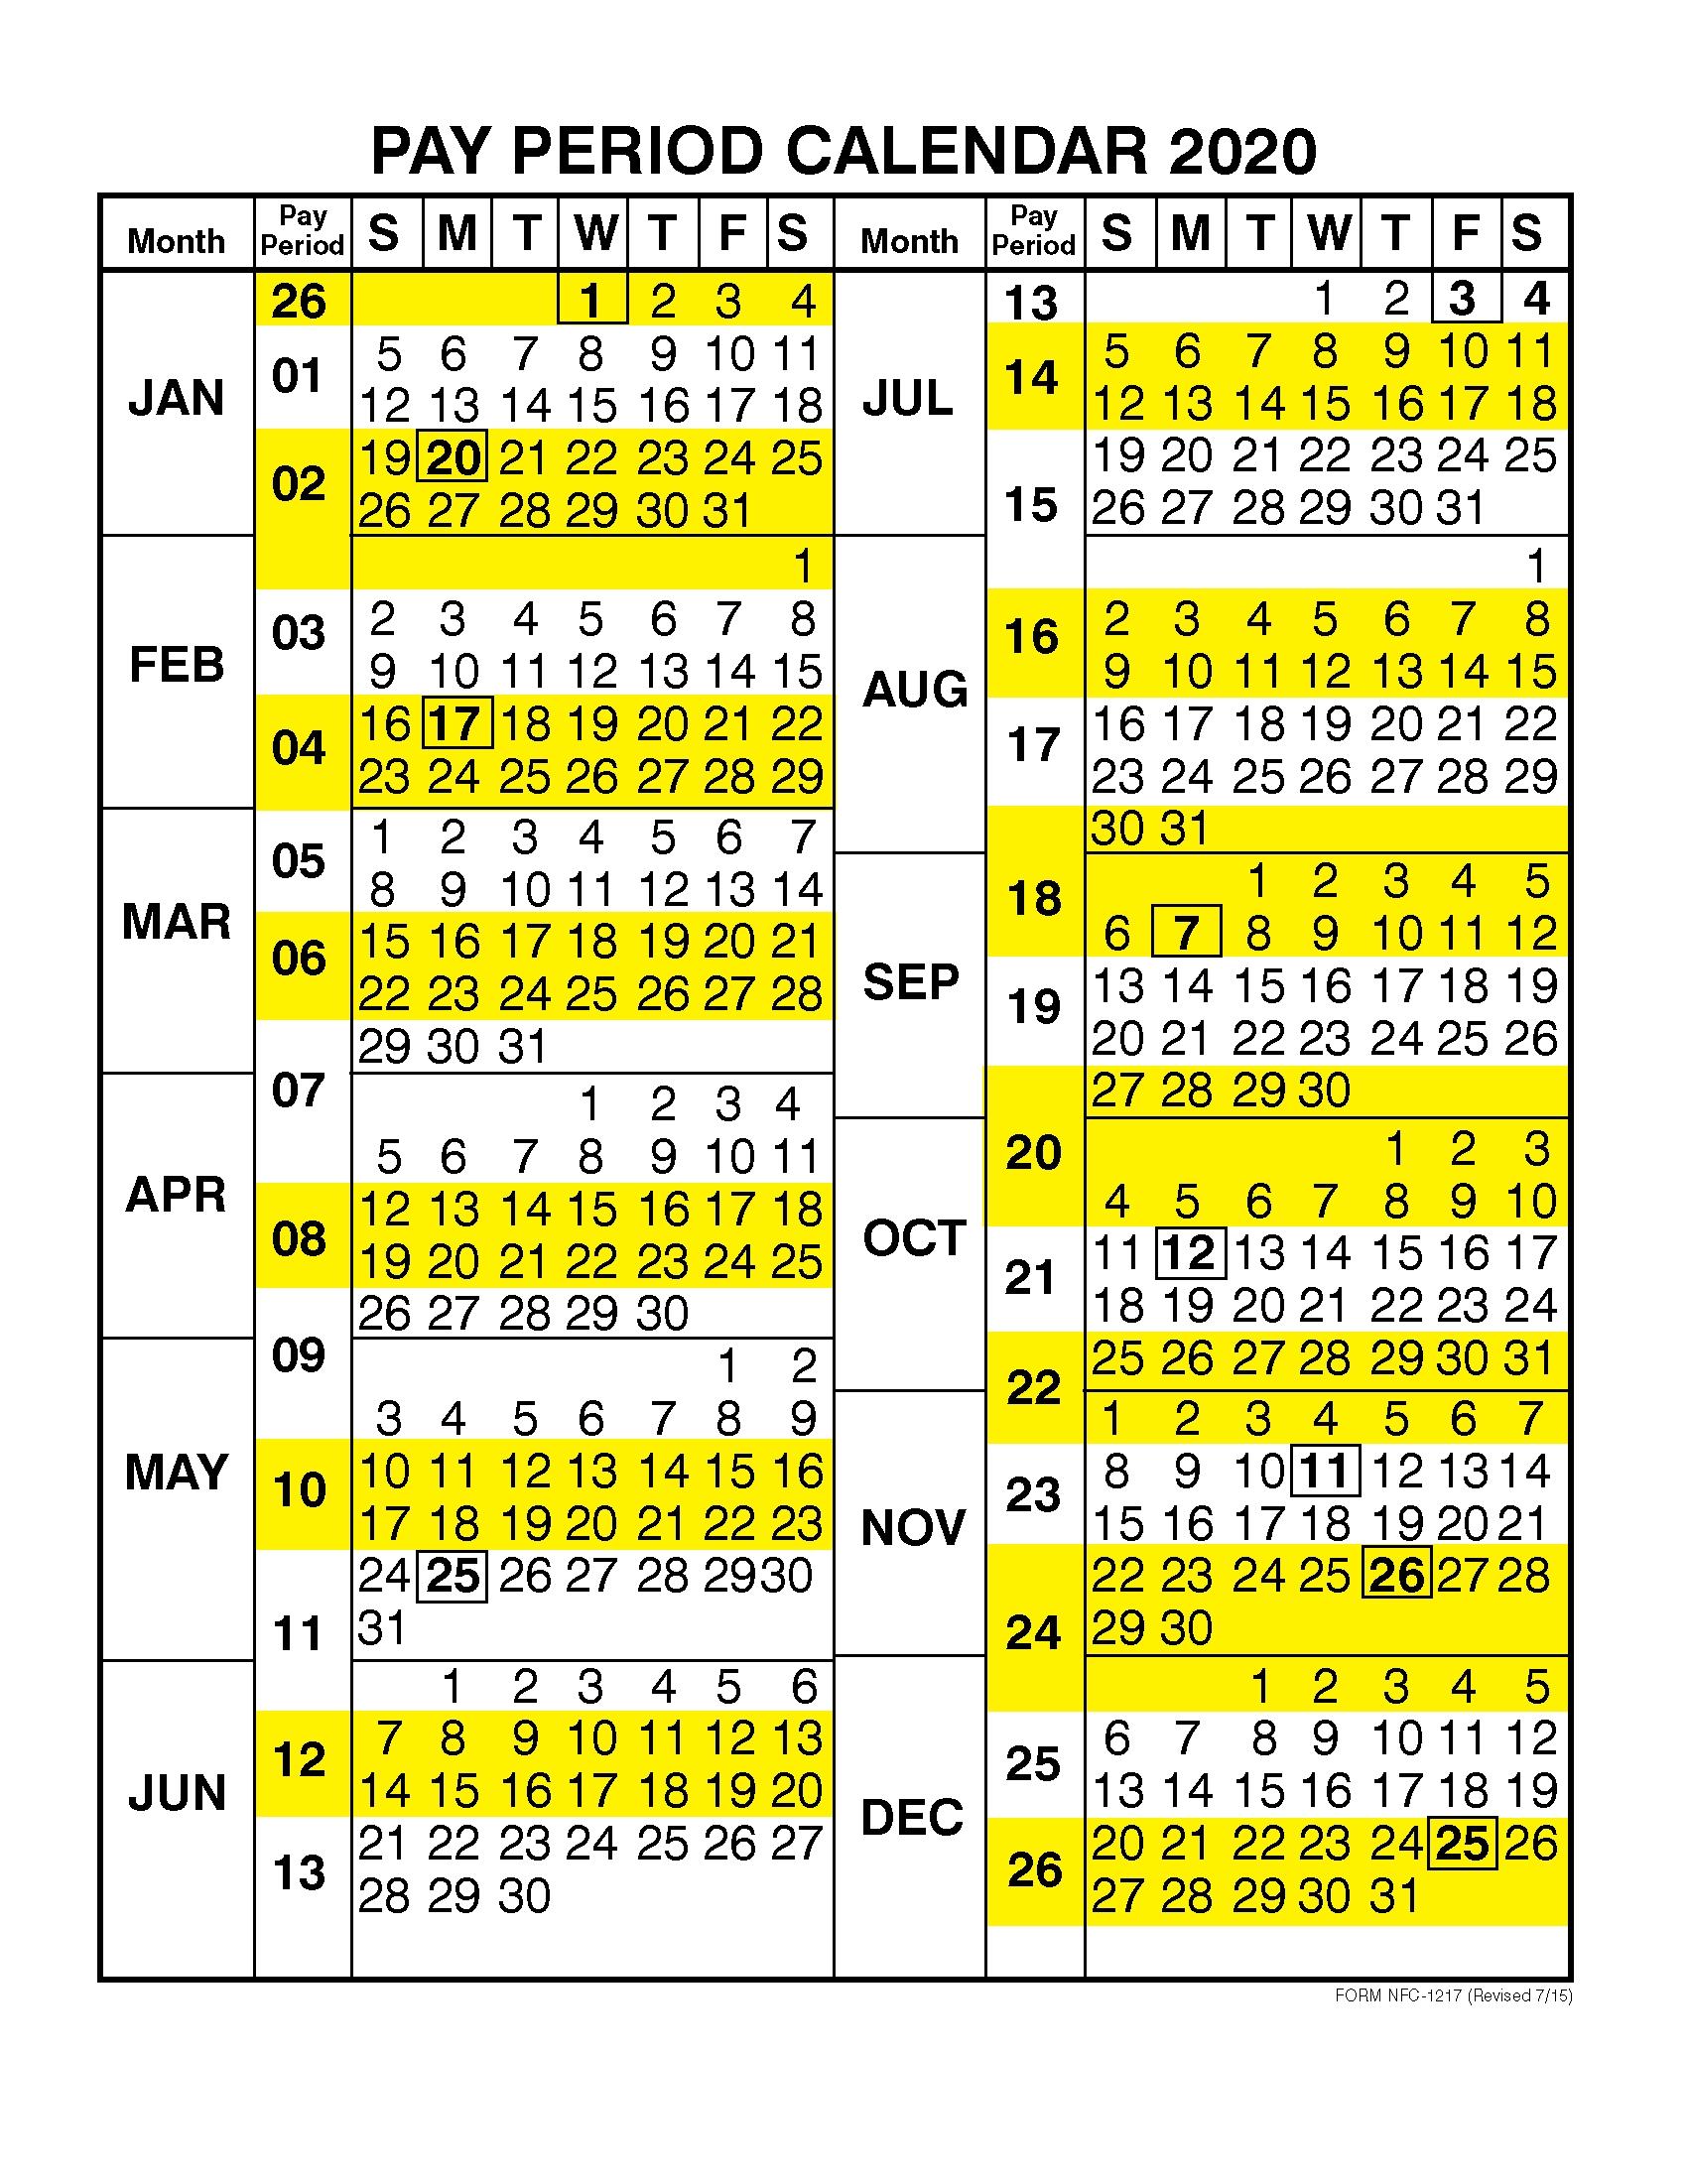 Csus Payroll Calendar 2020 | 2021 Pay Periods Calendar  Fy 2021 Pay Period Calendar